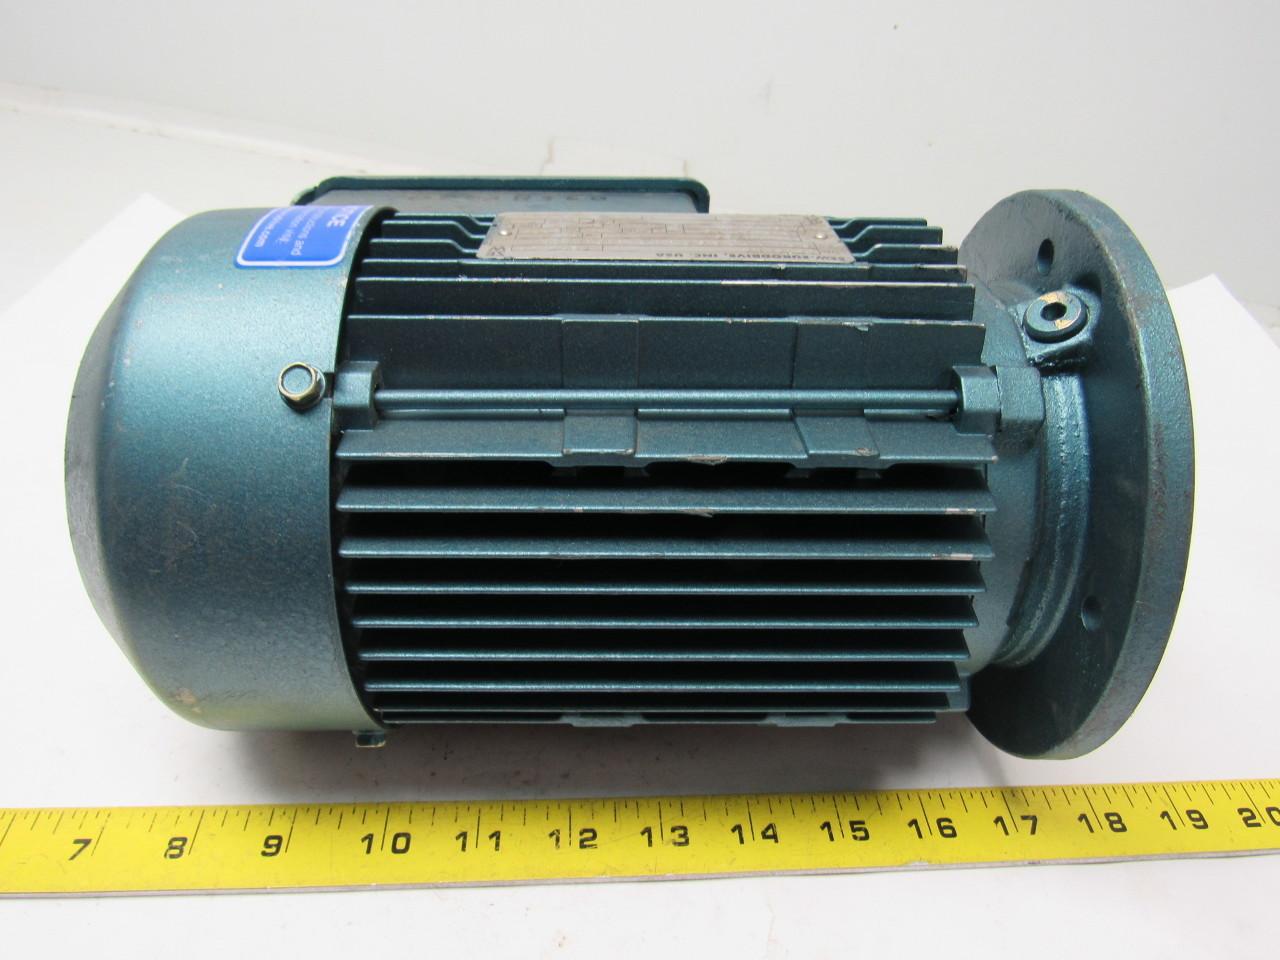 Sew eurodrive dft80k4 3 4 hp electric motor 230 460v 3ph for 3 hp electric motor